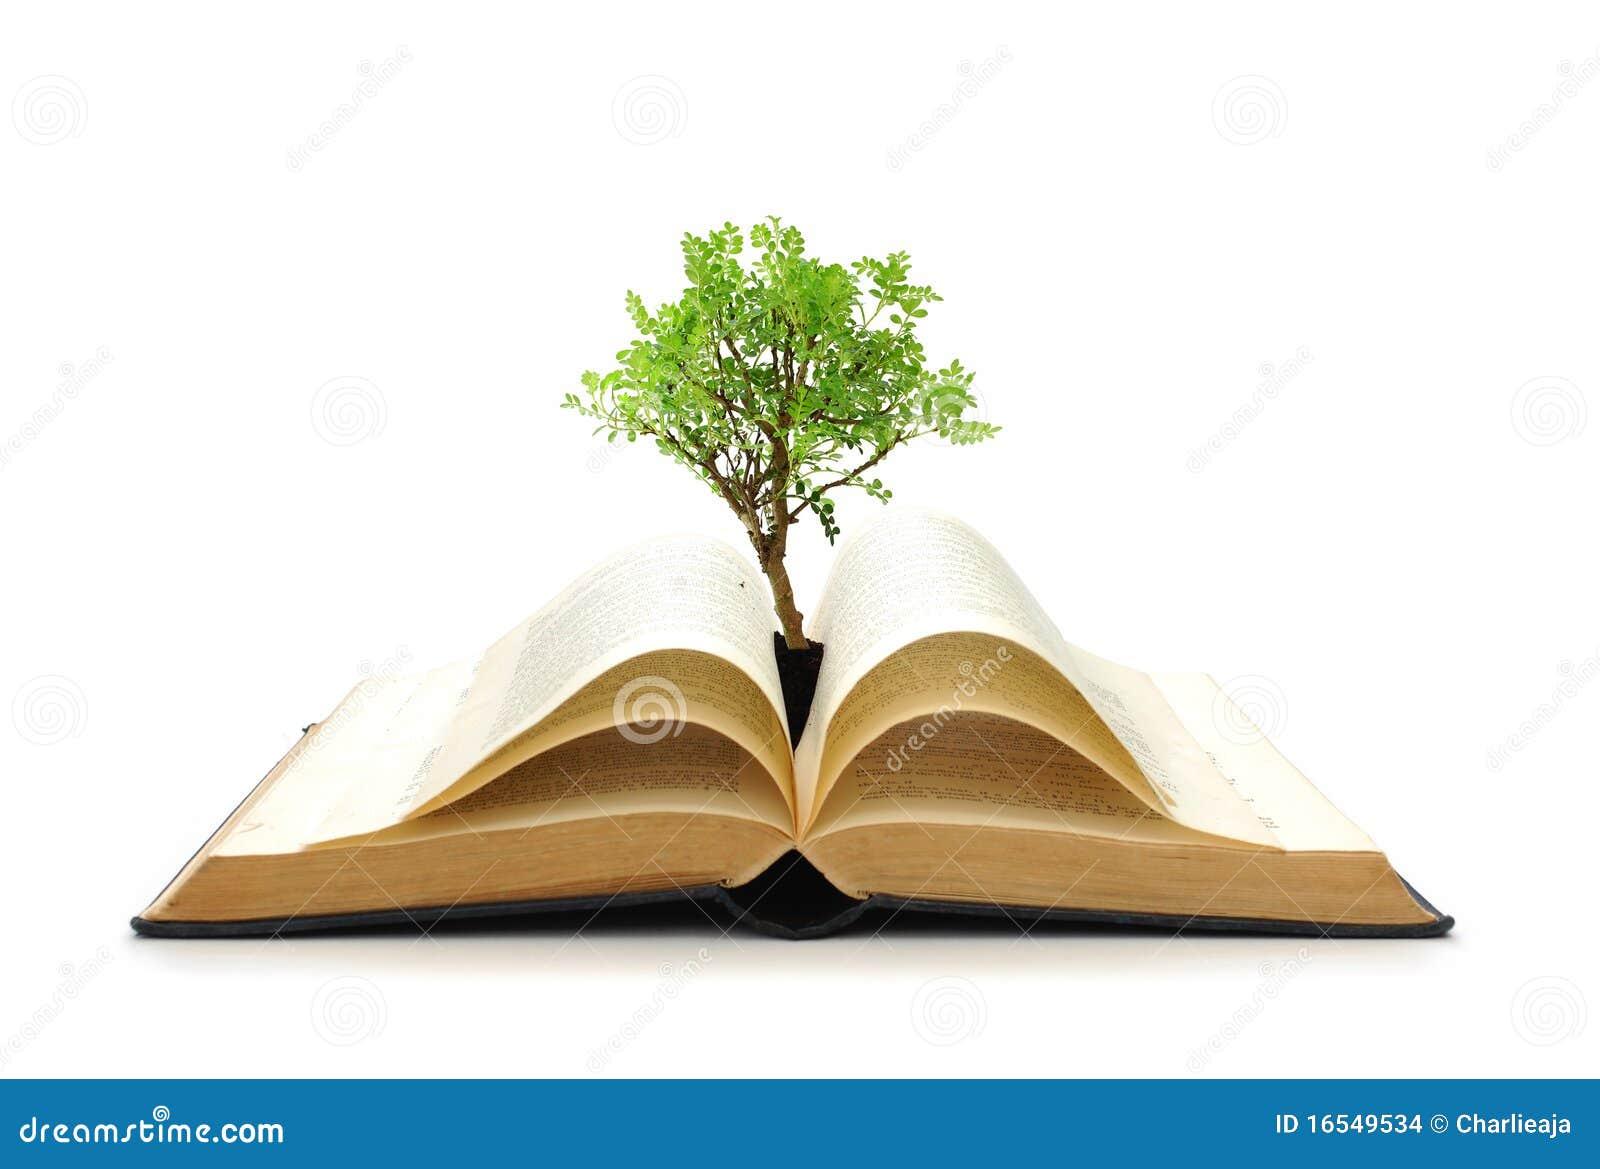 how to make trees grow shorter